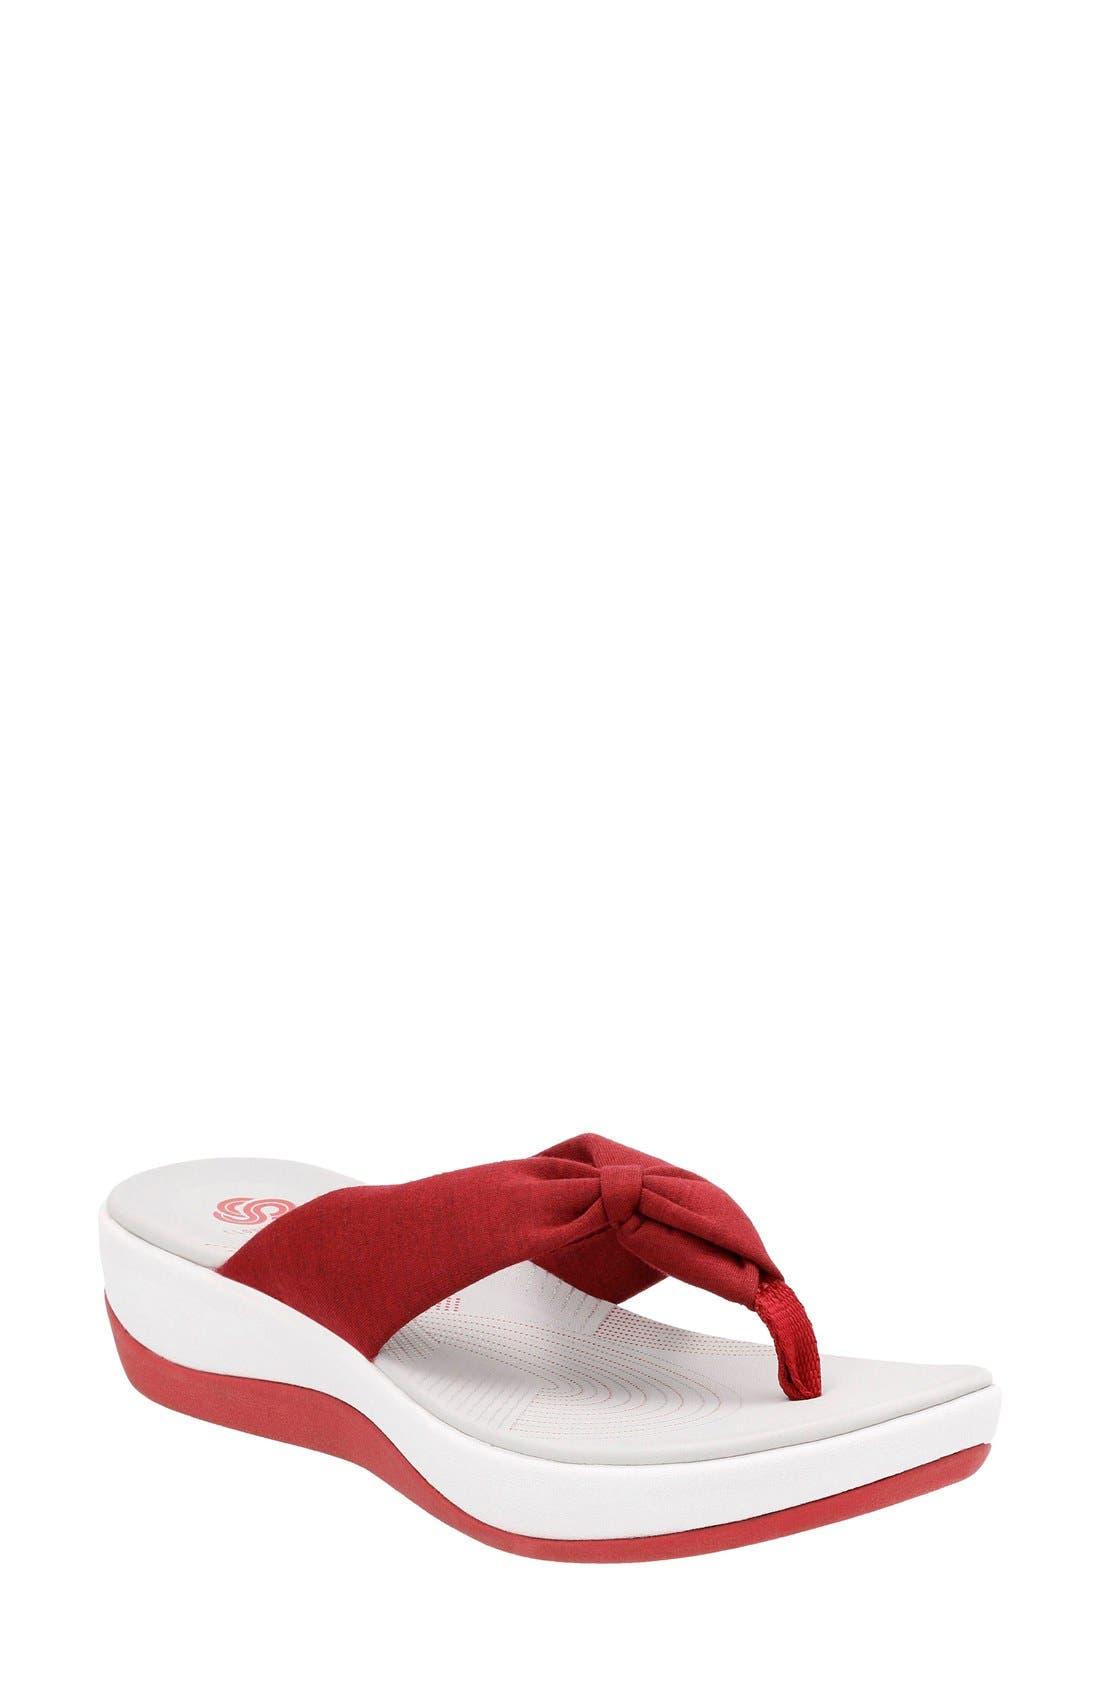 Arla Glison Flip Flop,                             Main thumbnail 1, color,                             Red Fabric